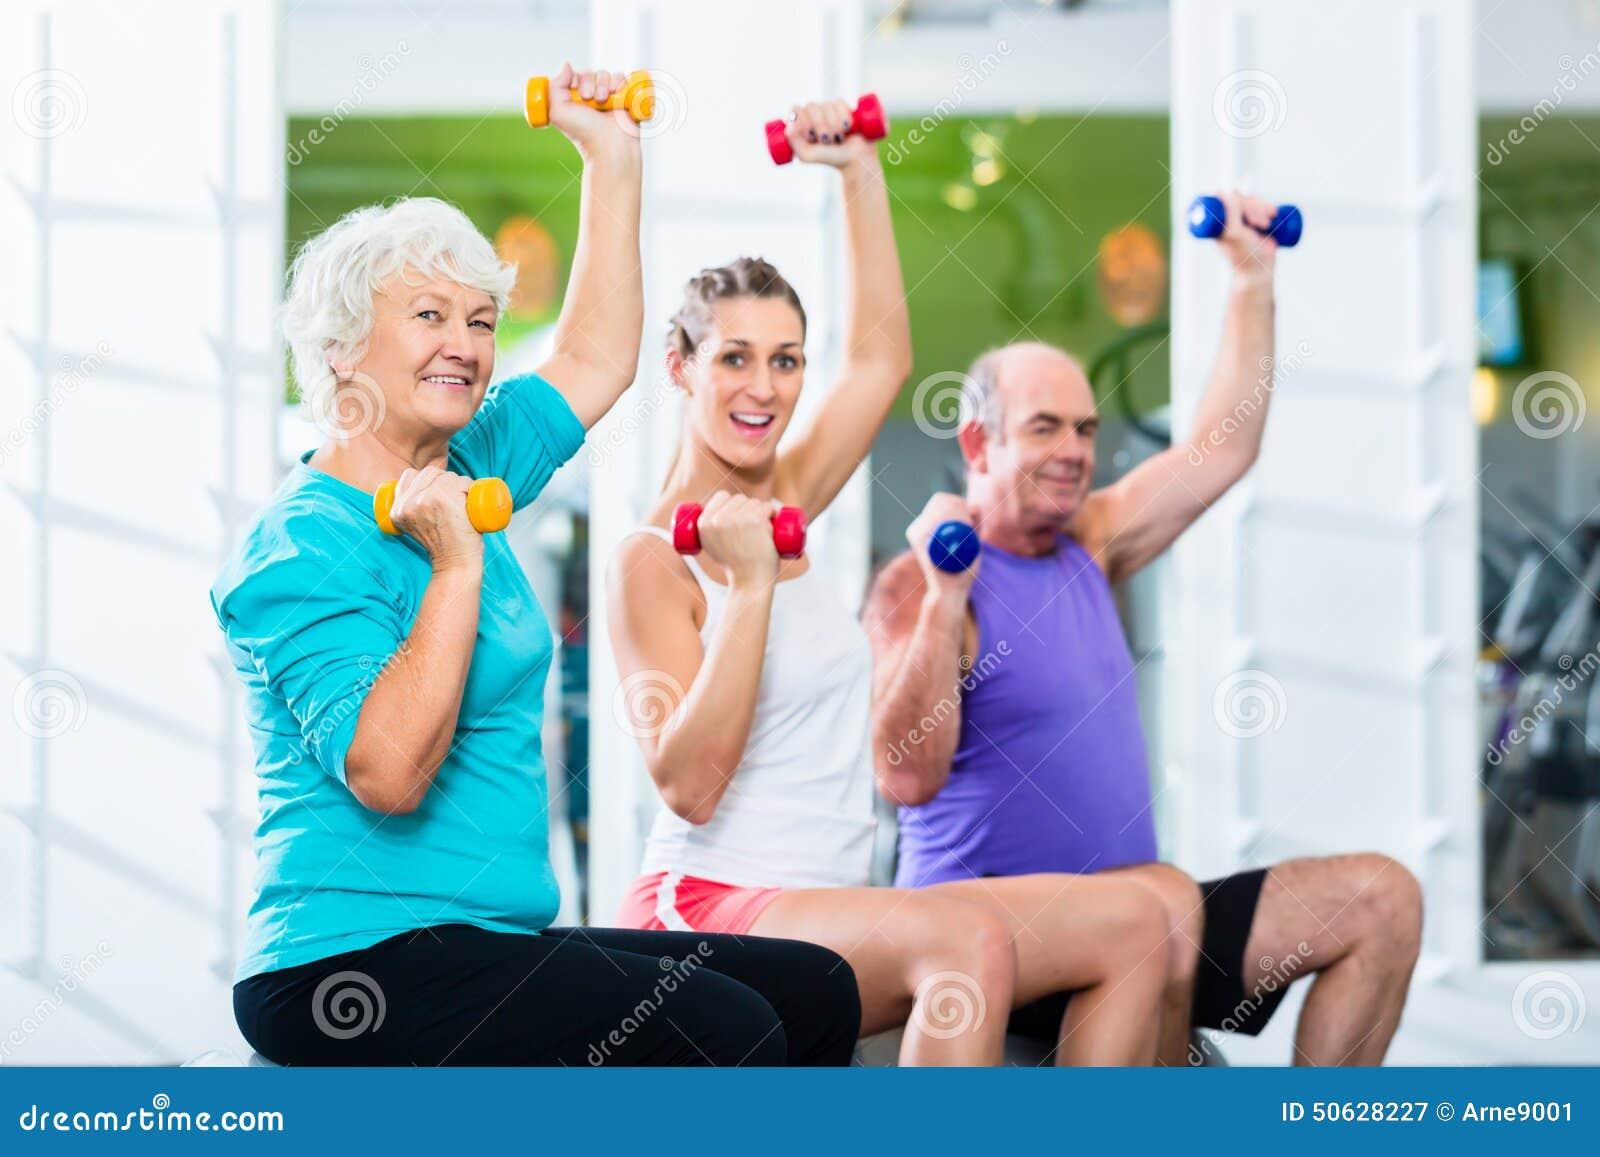 Gym For Seniors